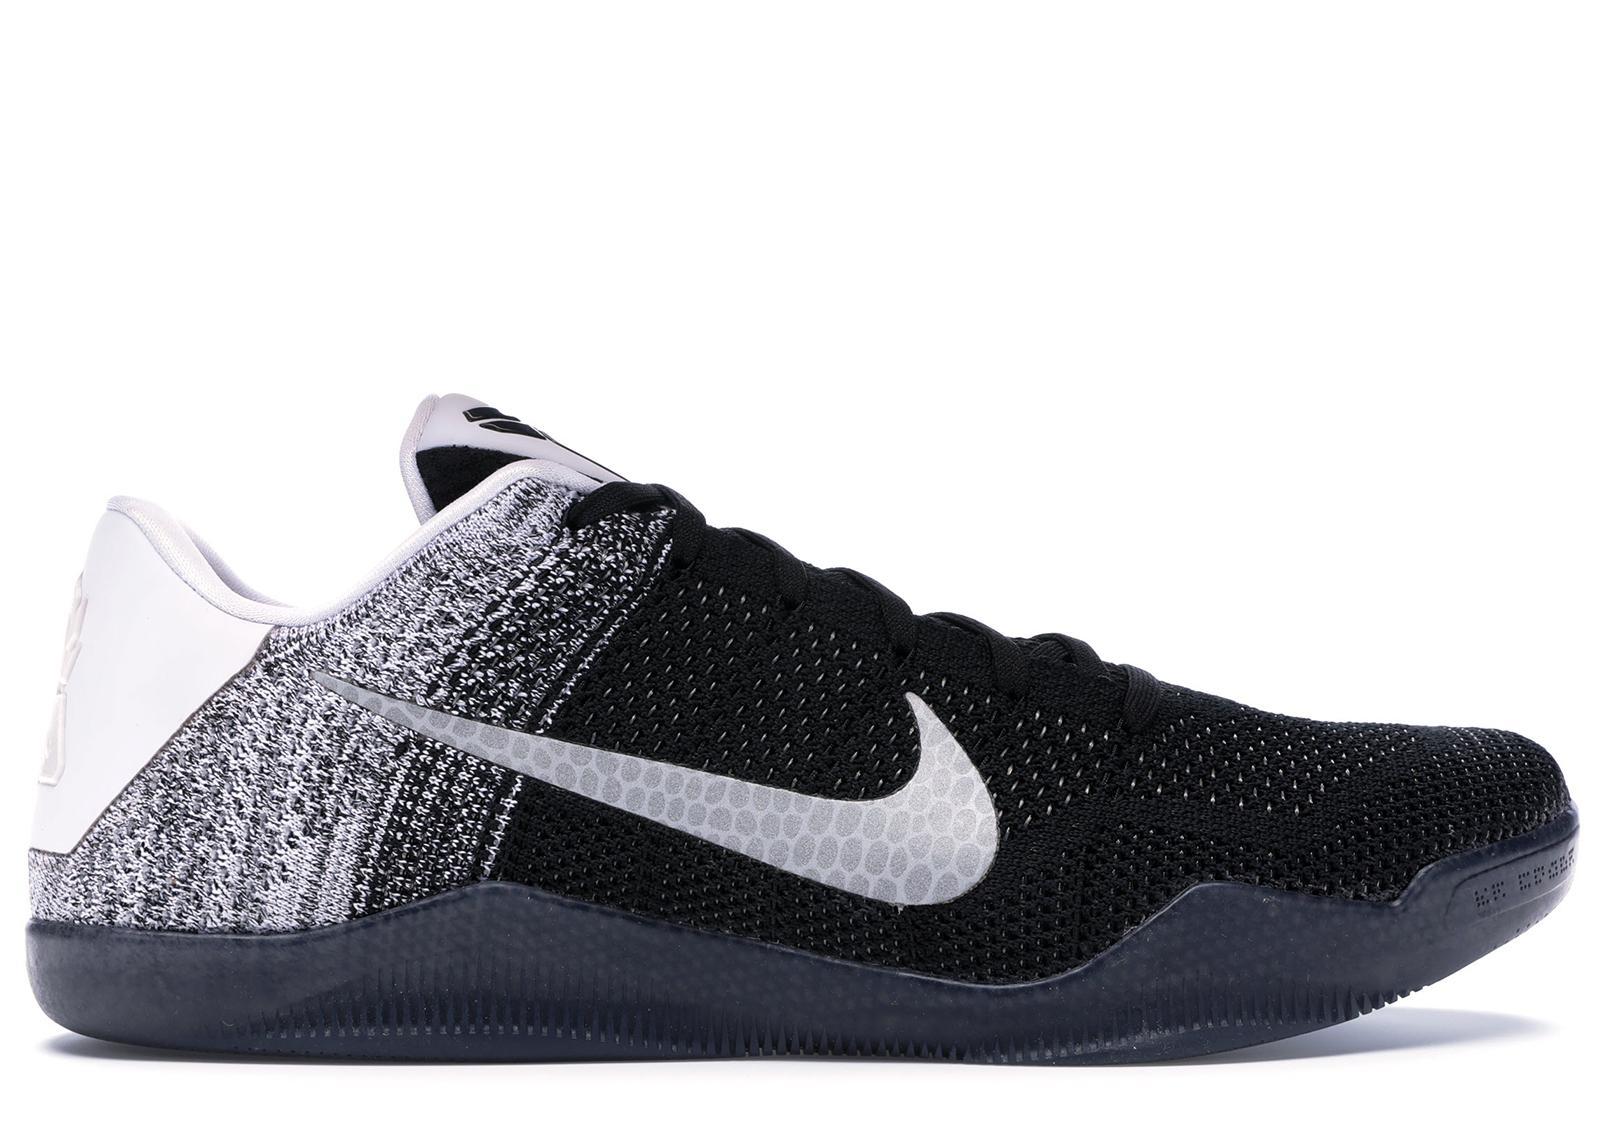 Nike Kobe 11 Elite Low Last Emperor in